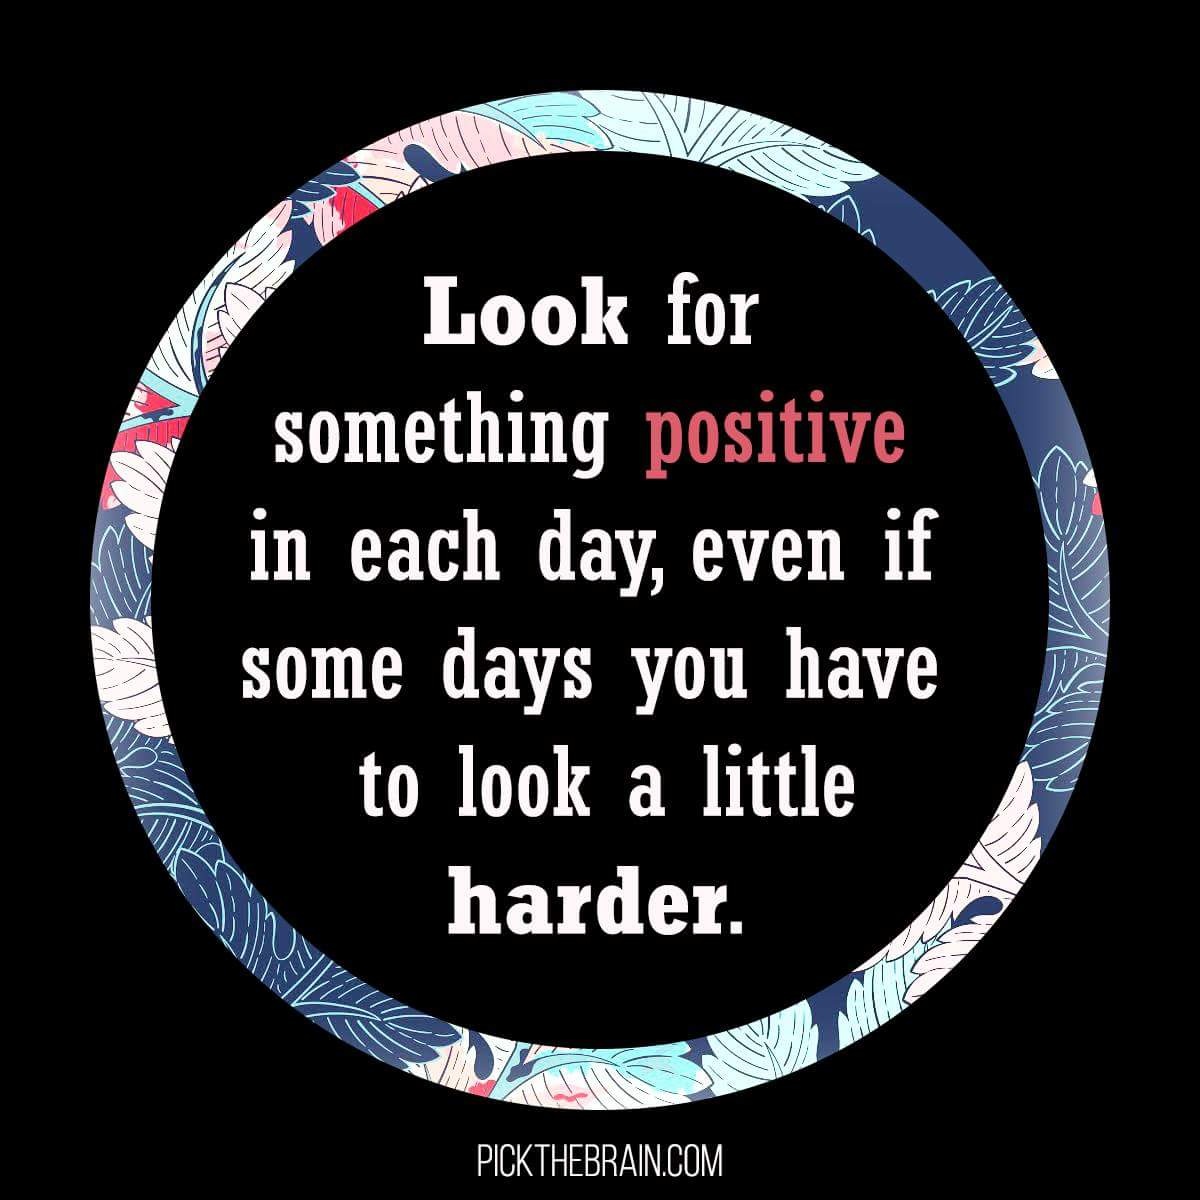 Look for something #positive in each day,...  #InspireThemRetweetTuesday #defstar5 #Mpgvip #IQRTG #makeyourownlane #spdc #SuccessTRAIN #SMM<br>http://pic.twitter.com/opNX1ttYN2